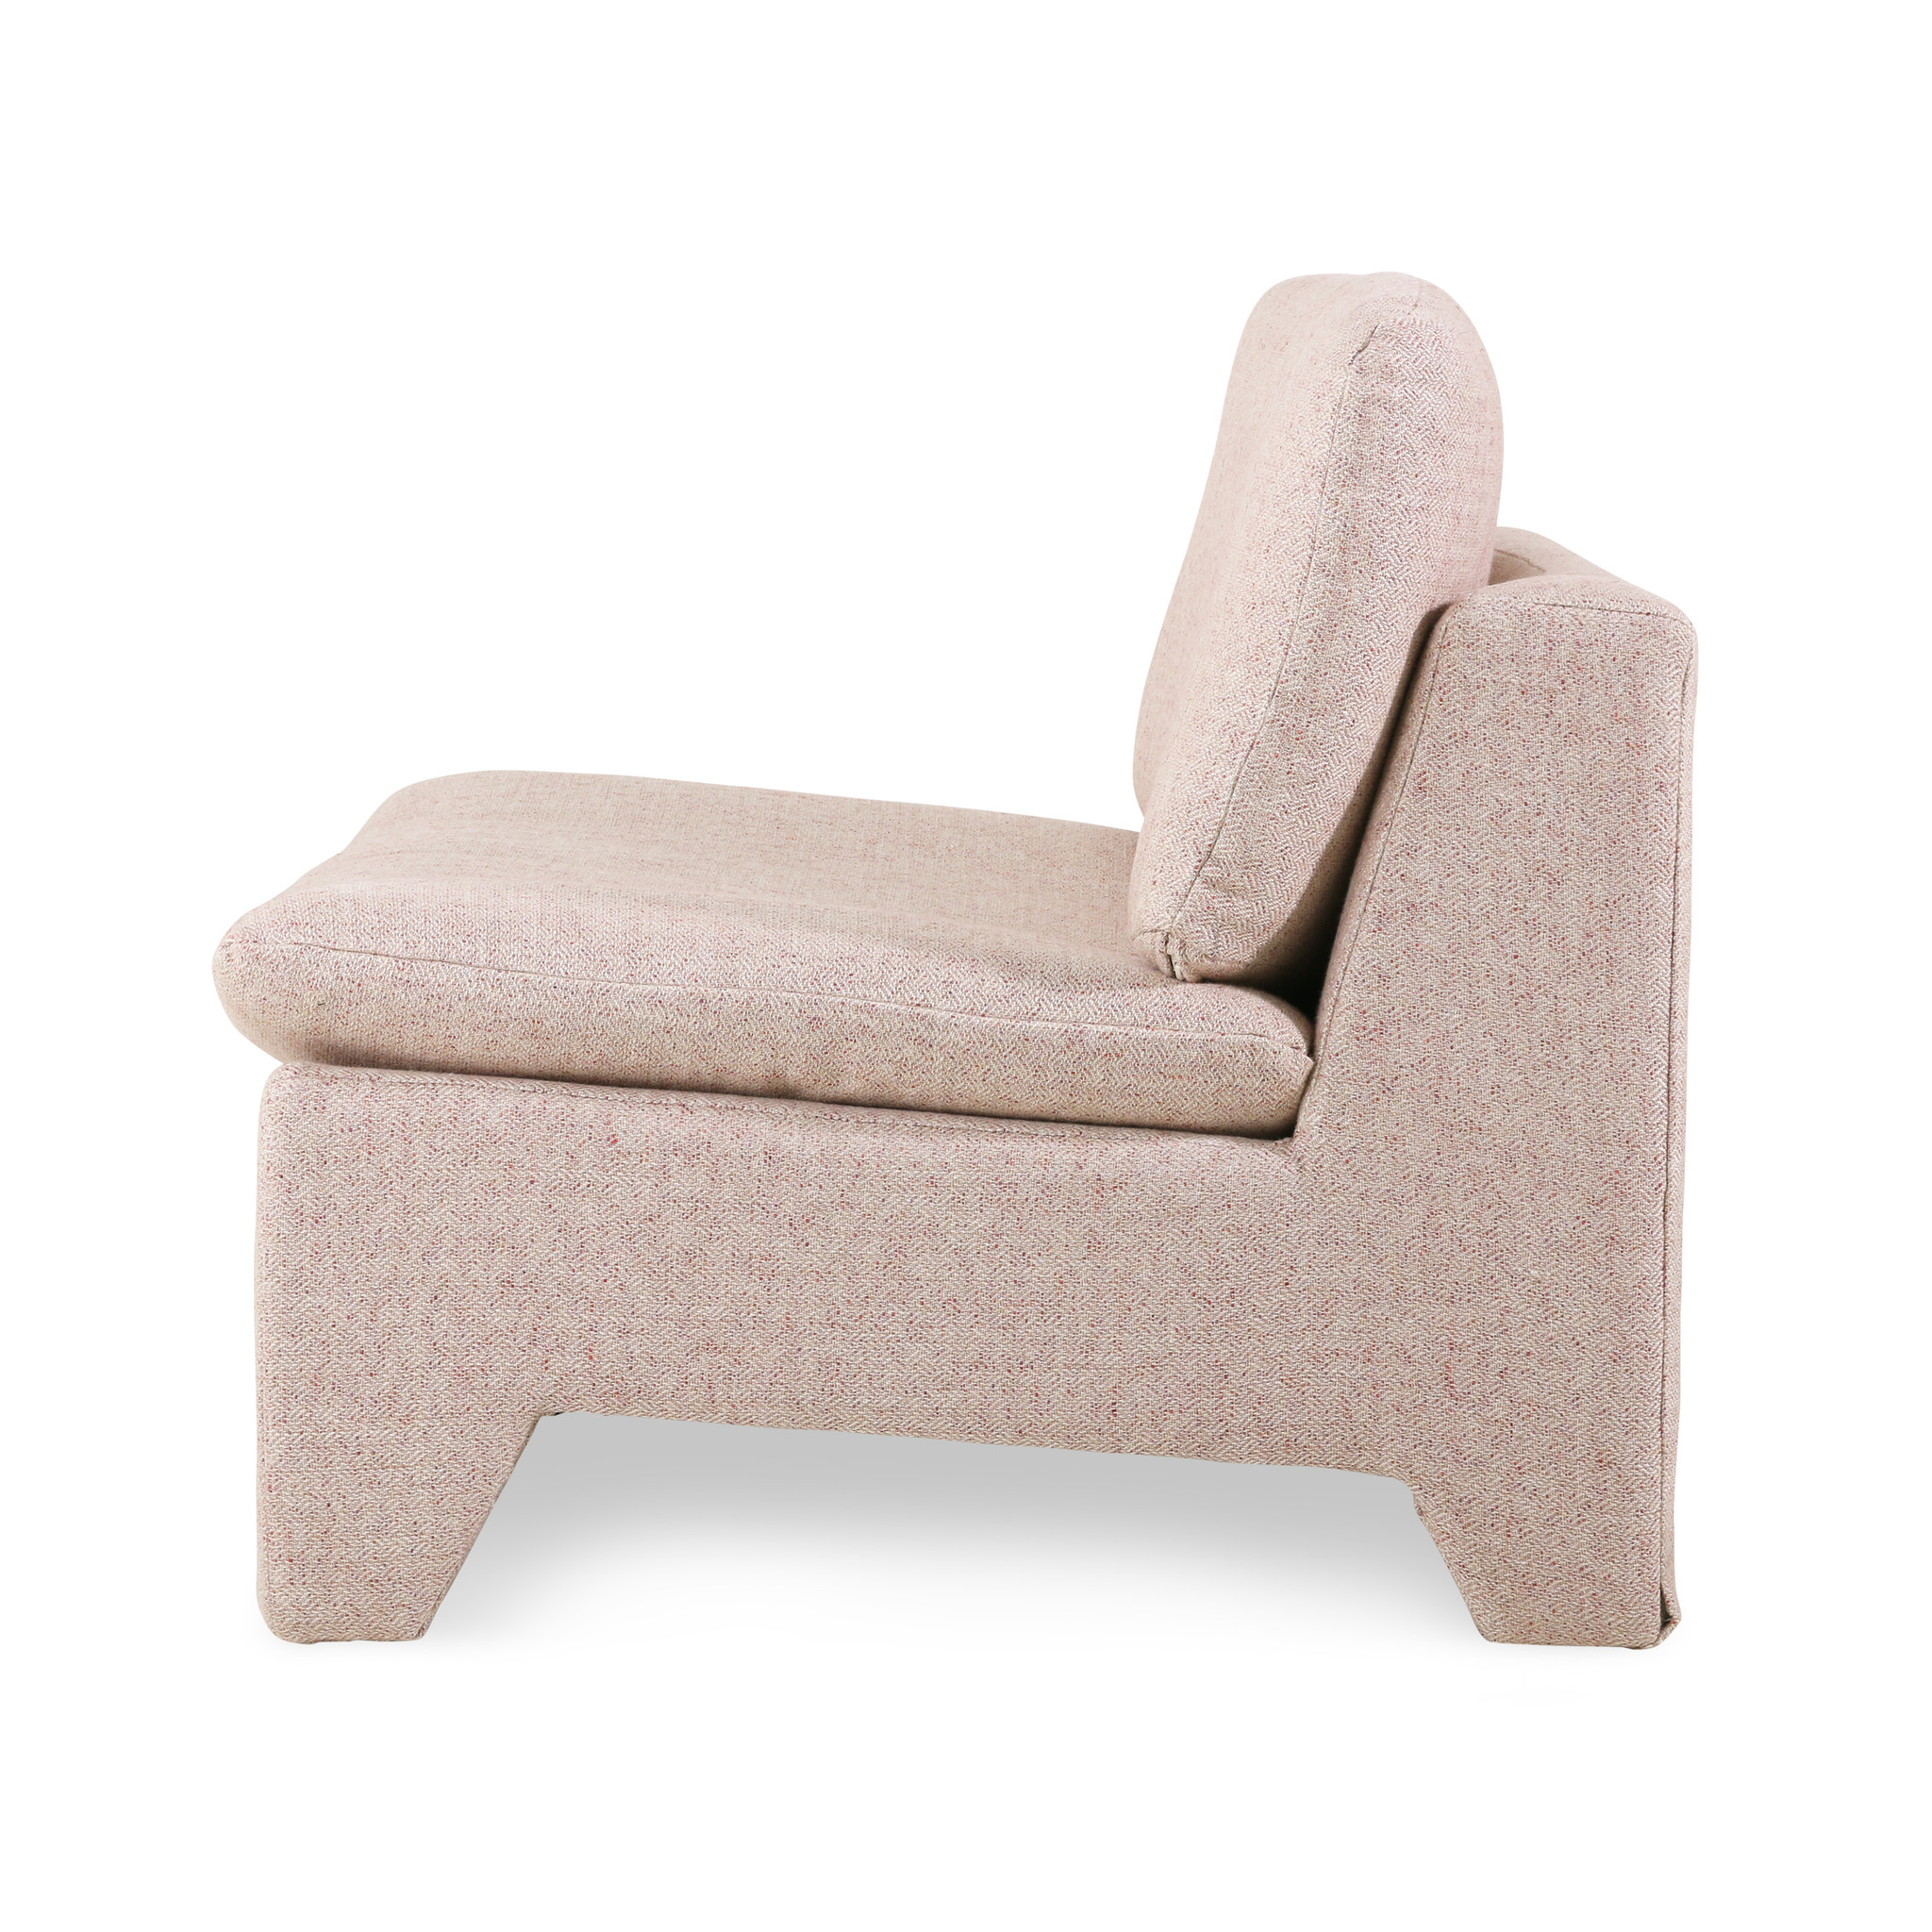 HKliving Retro lounge fauteuil - nude melange